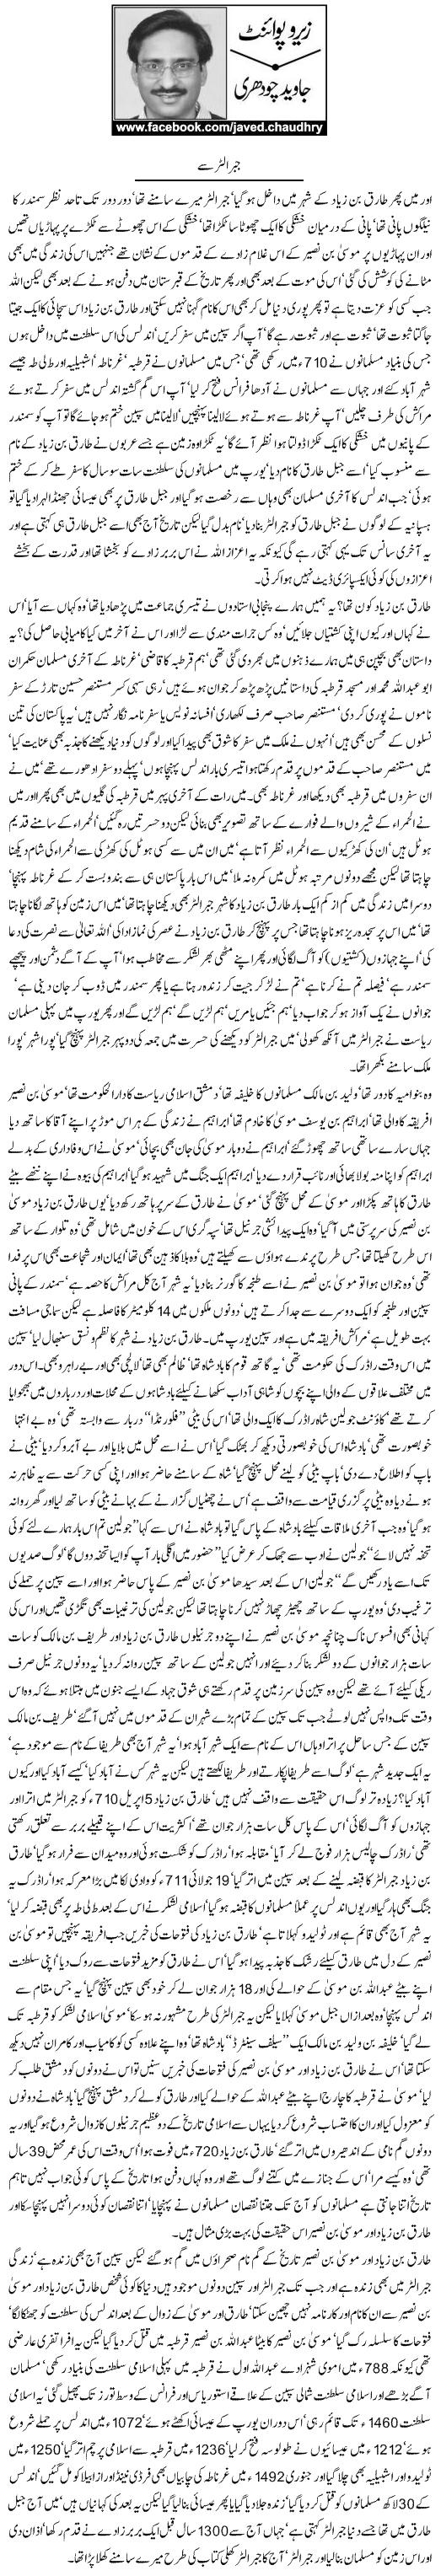 Javed Chaudhry Column | Gibraltar Say | Zero Point